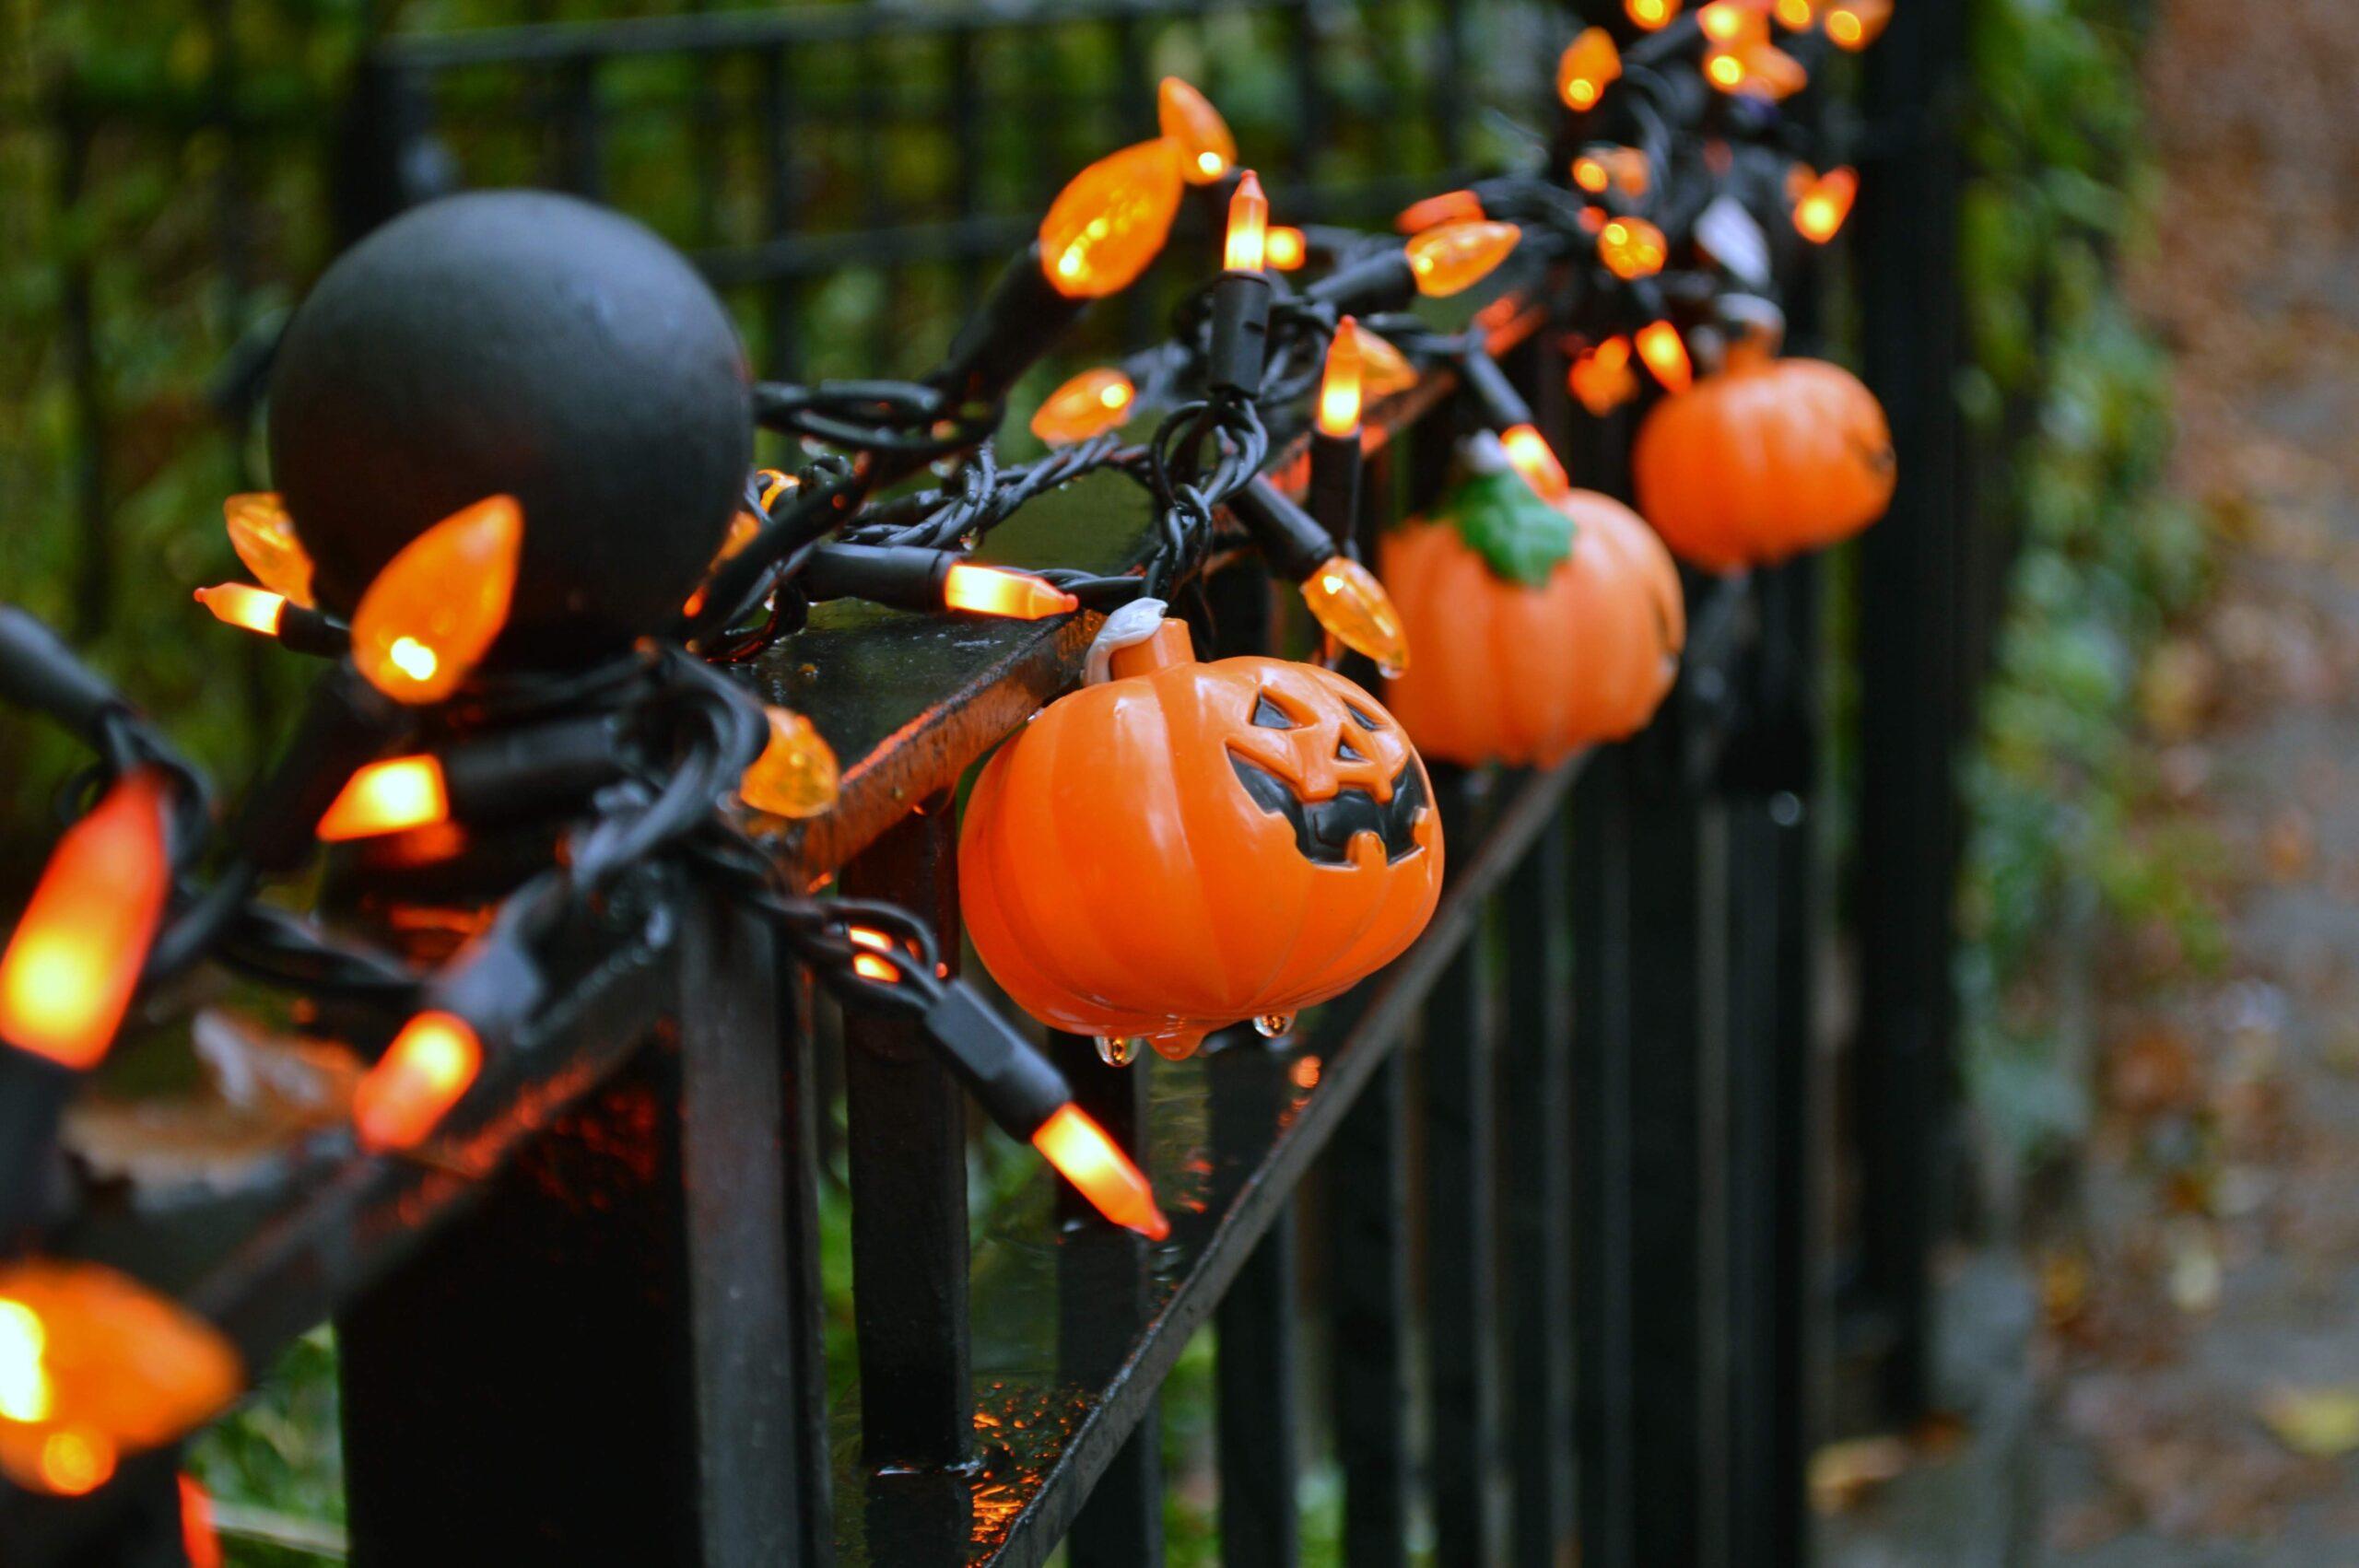 Jack-o'-lantern lights on a railing